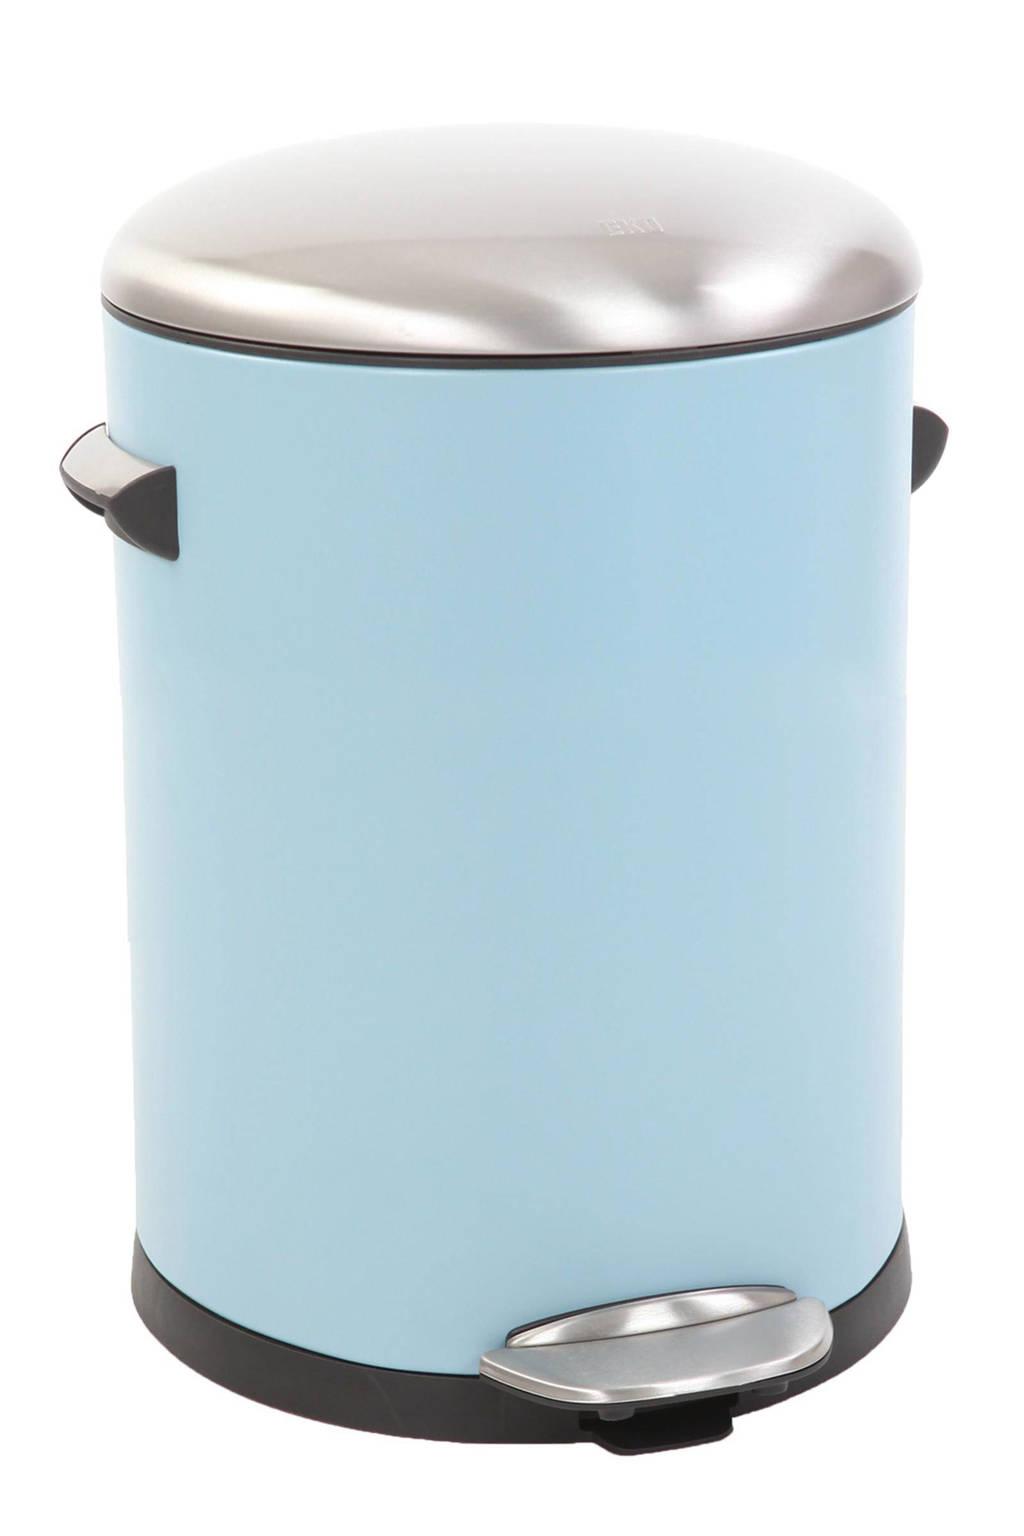 EKO Belle Deluxe pedaalemmer  (5 liter), Blauw